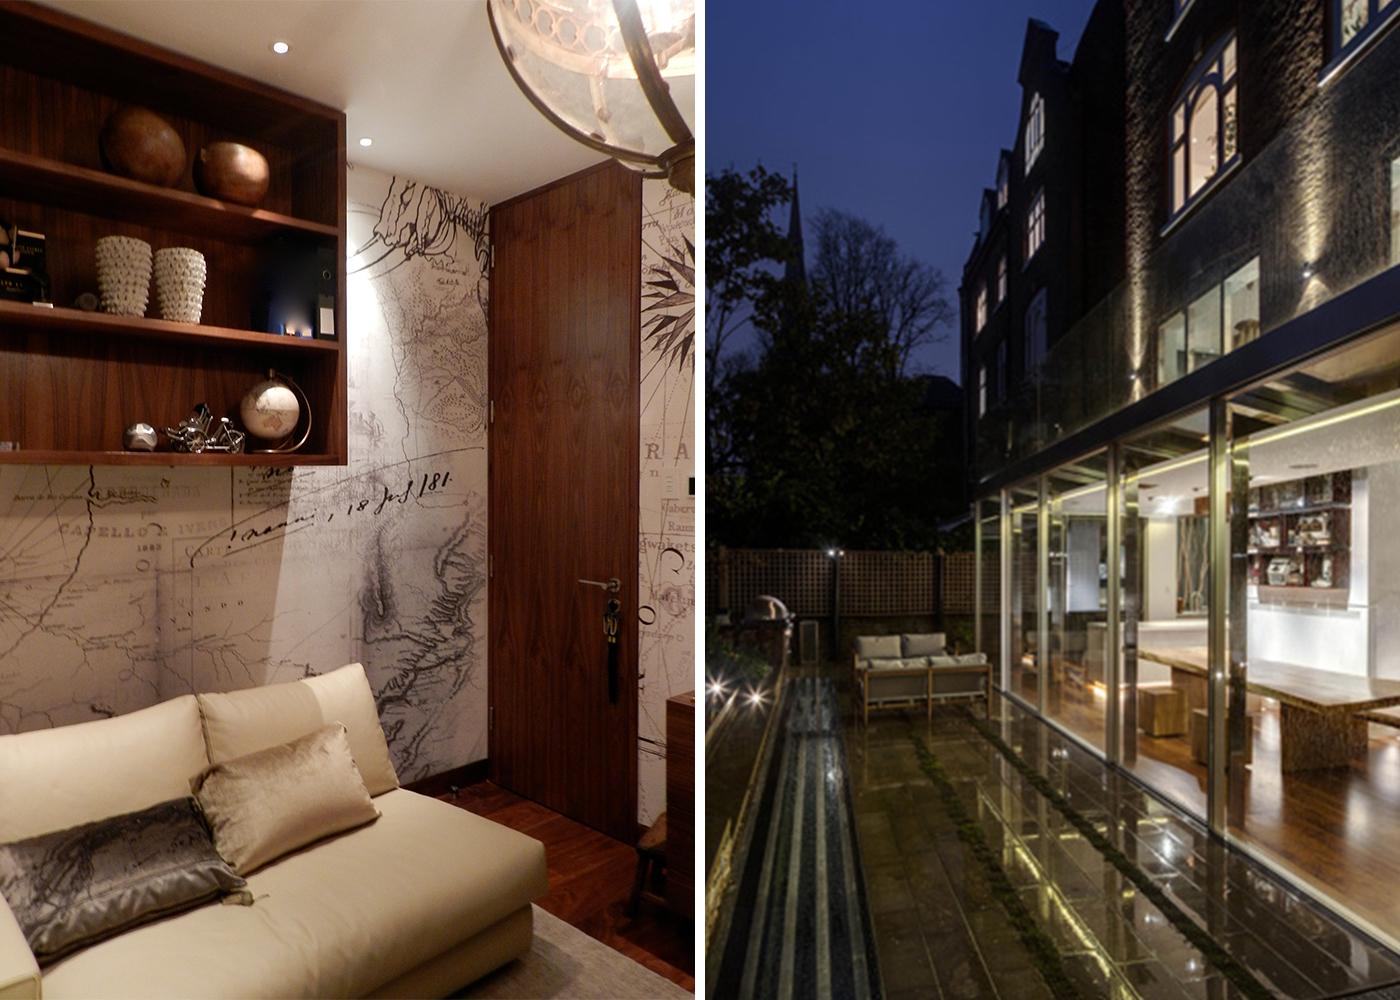 3_Hampstead_B_Collages.jpg